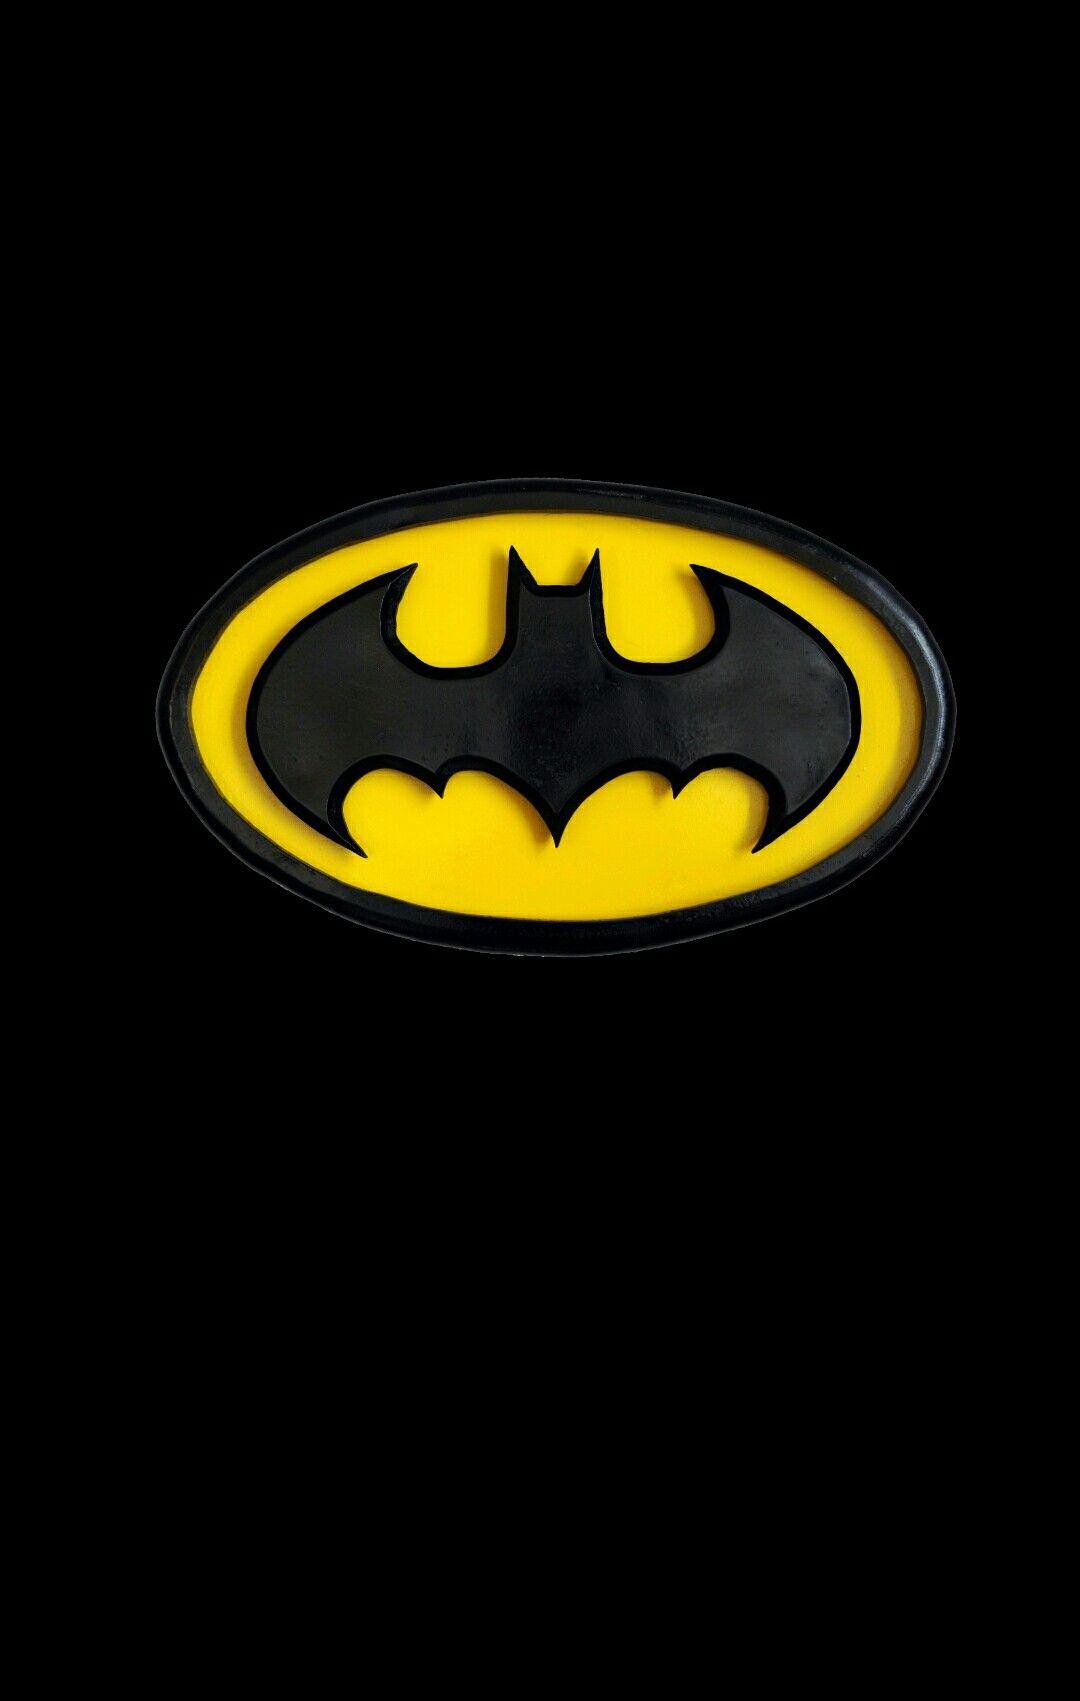 Pin by marcos gallis on bat symbol pinterest batman batman batman sign bat symbol dark knight superman symbols icons buycottarizona Image collections